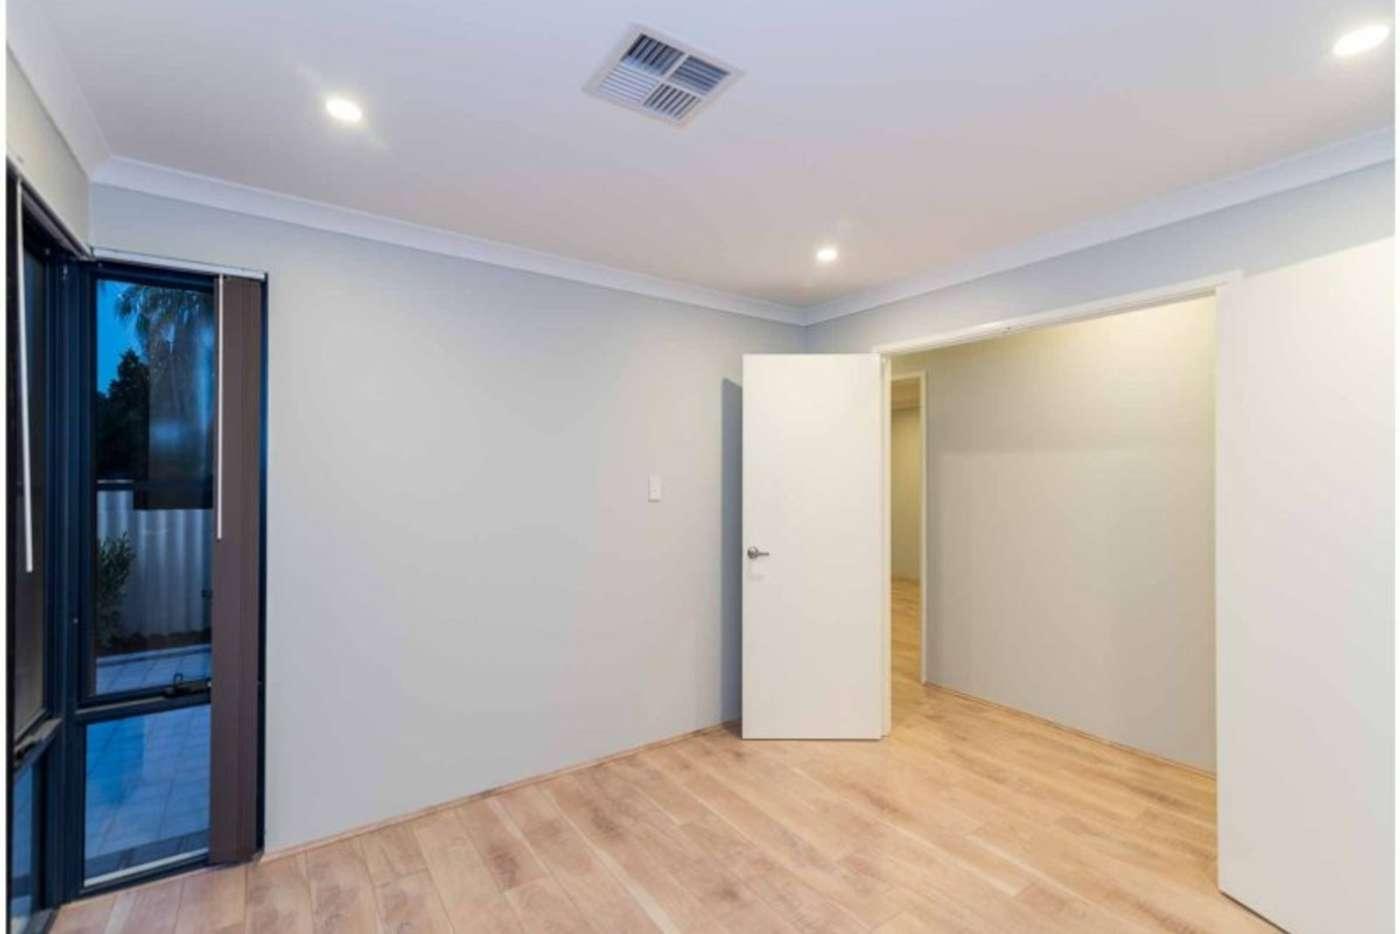 Sixth view of Homely house listing, 59B Helm Street, Maddington WA 6109